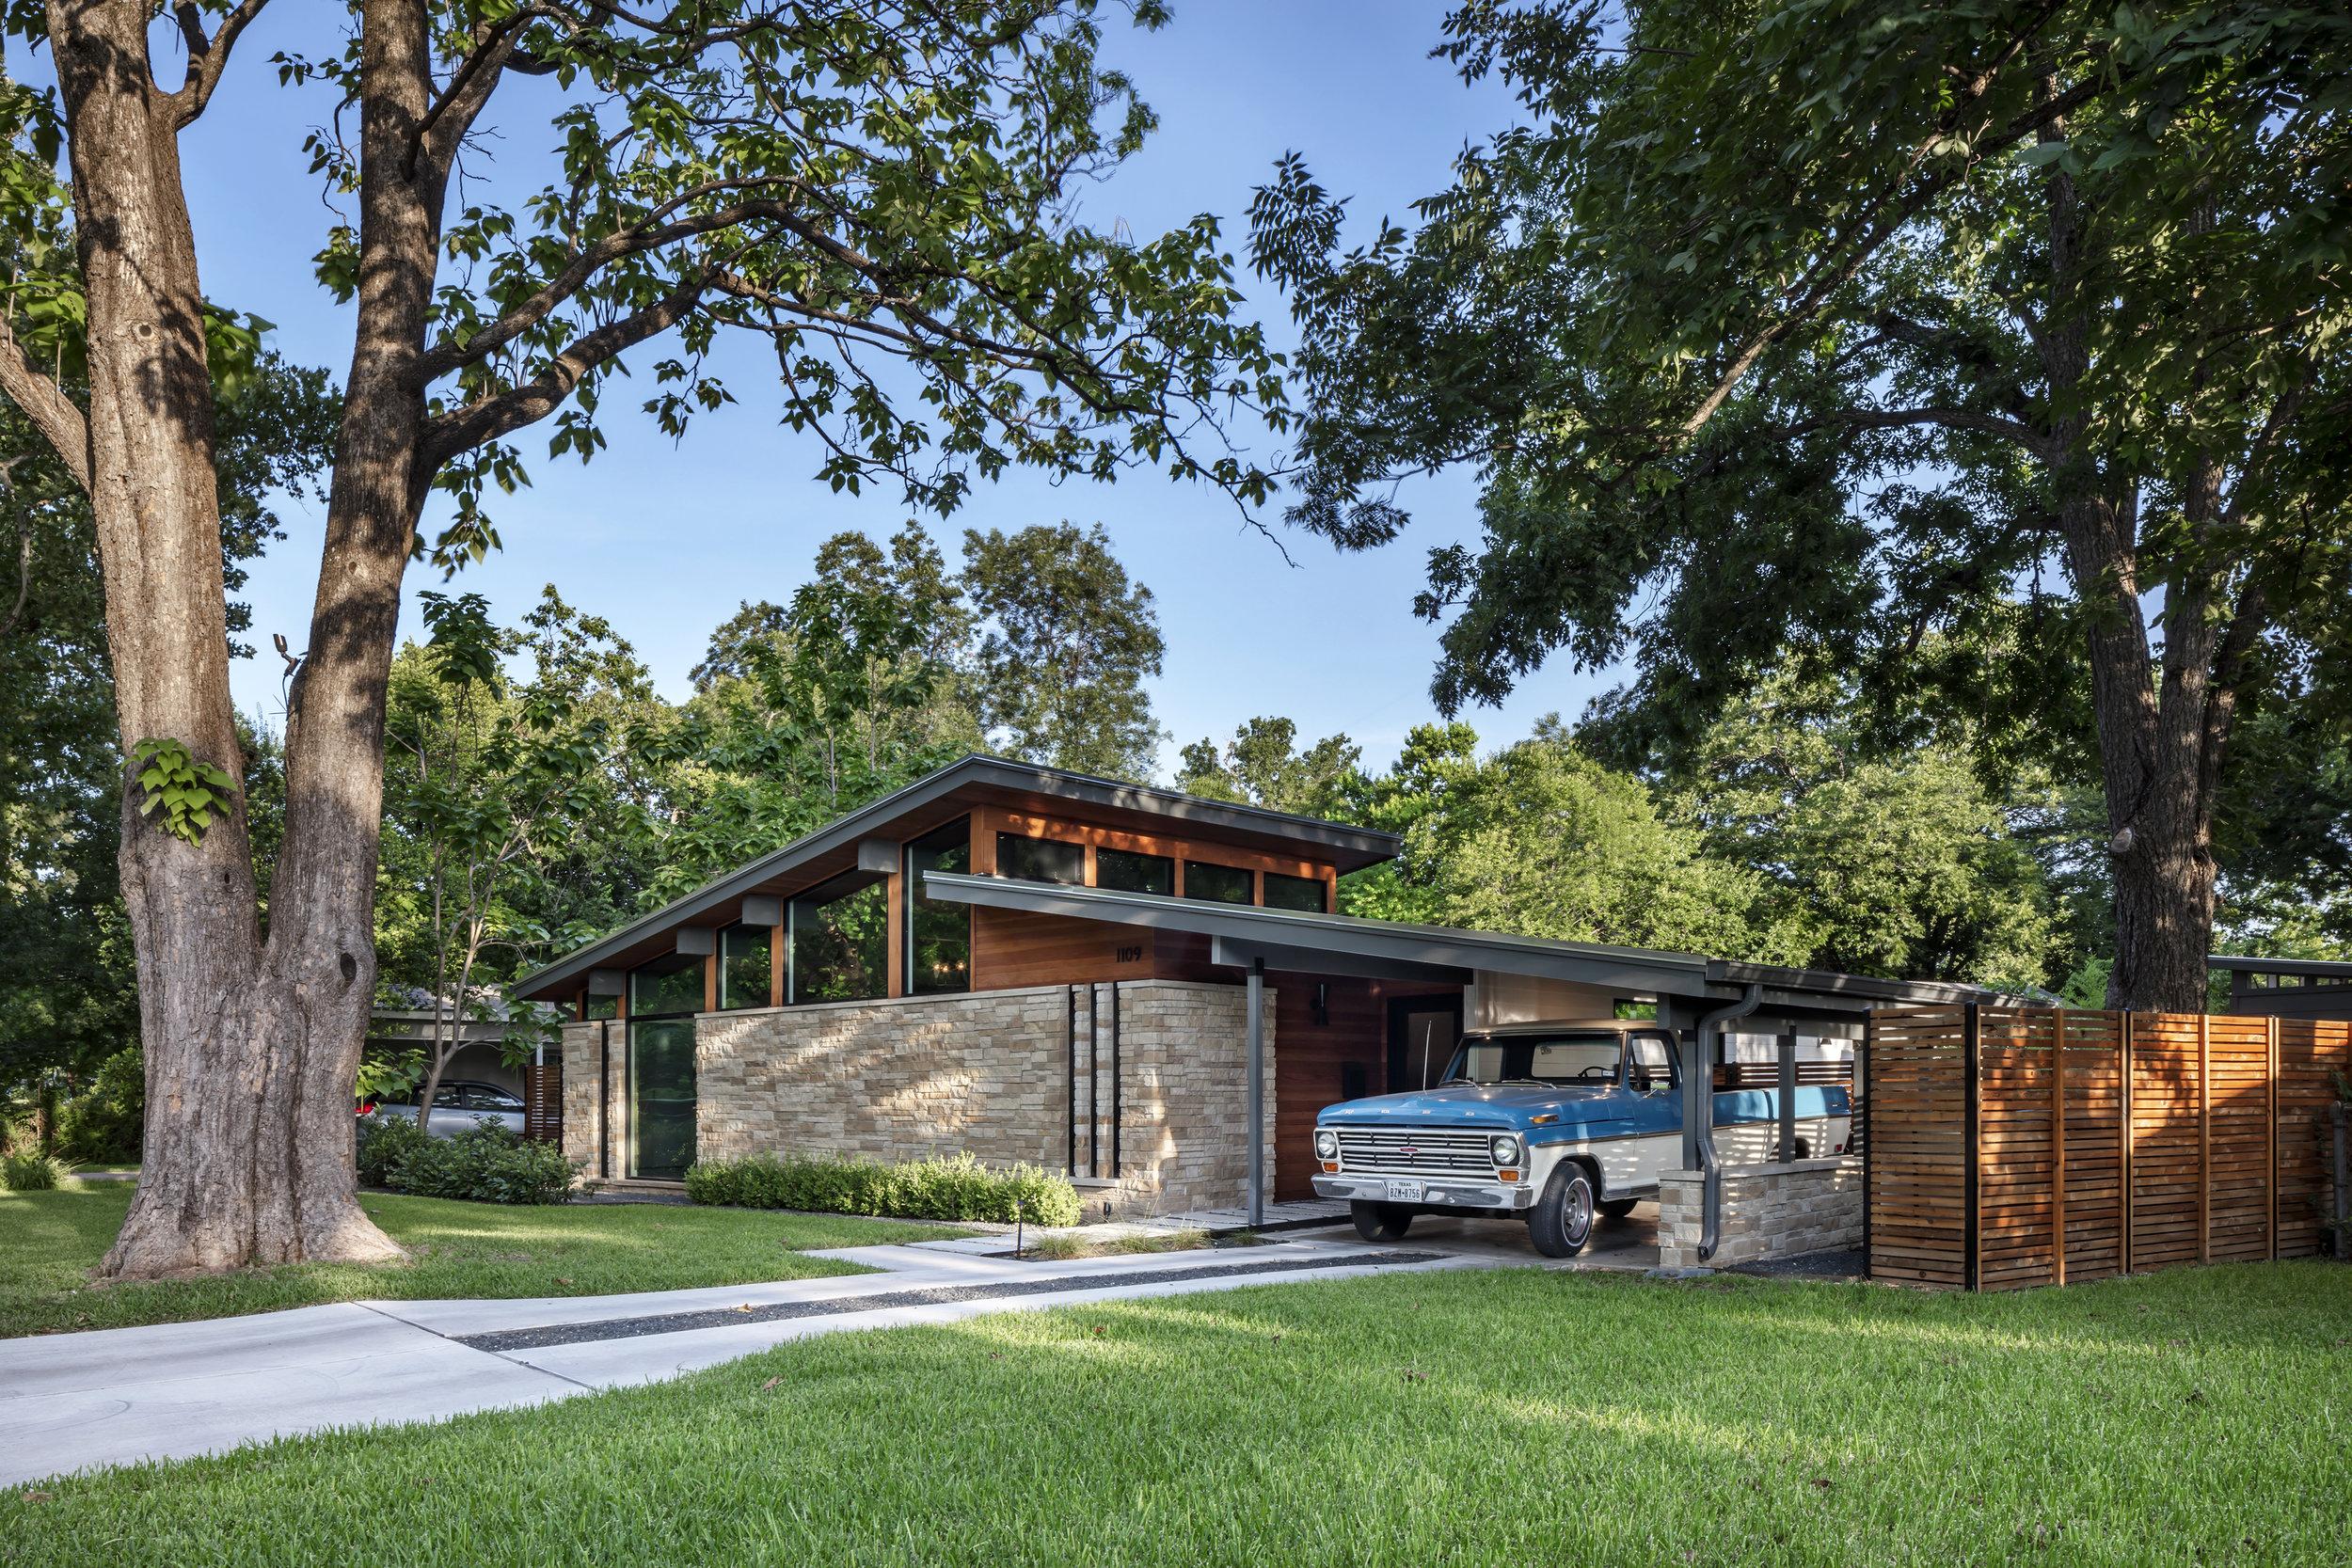 01 Re-Open House by Matt Fajkus Architecture - Photo by Charles Davis Smith.jpg